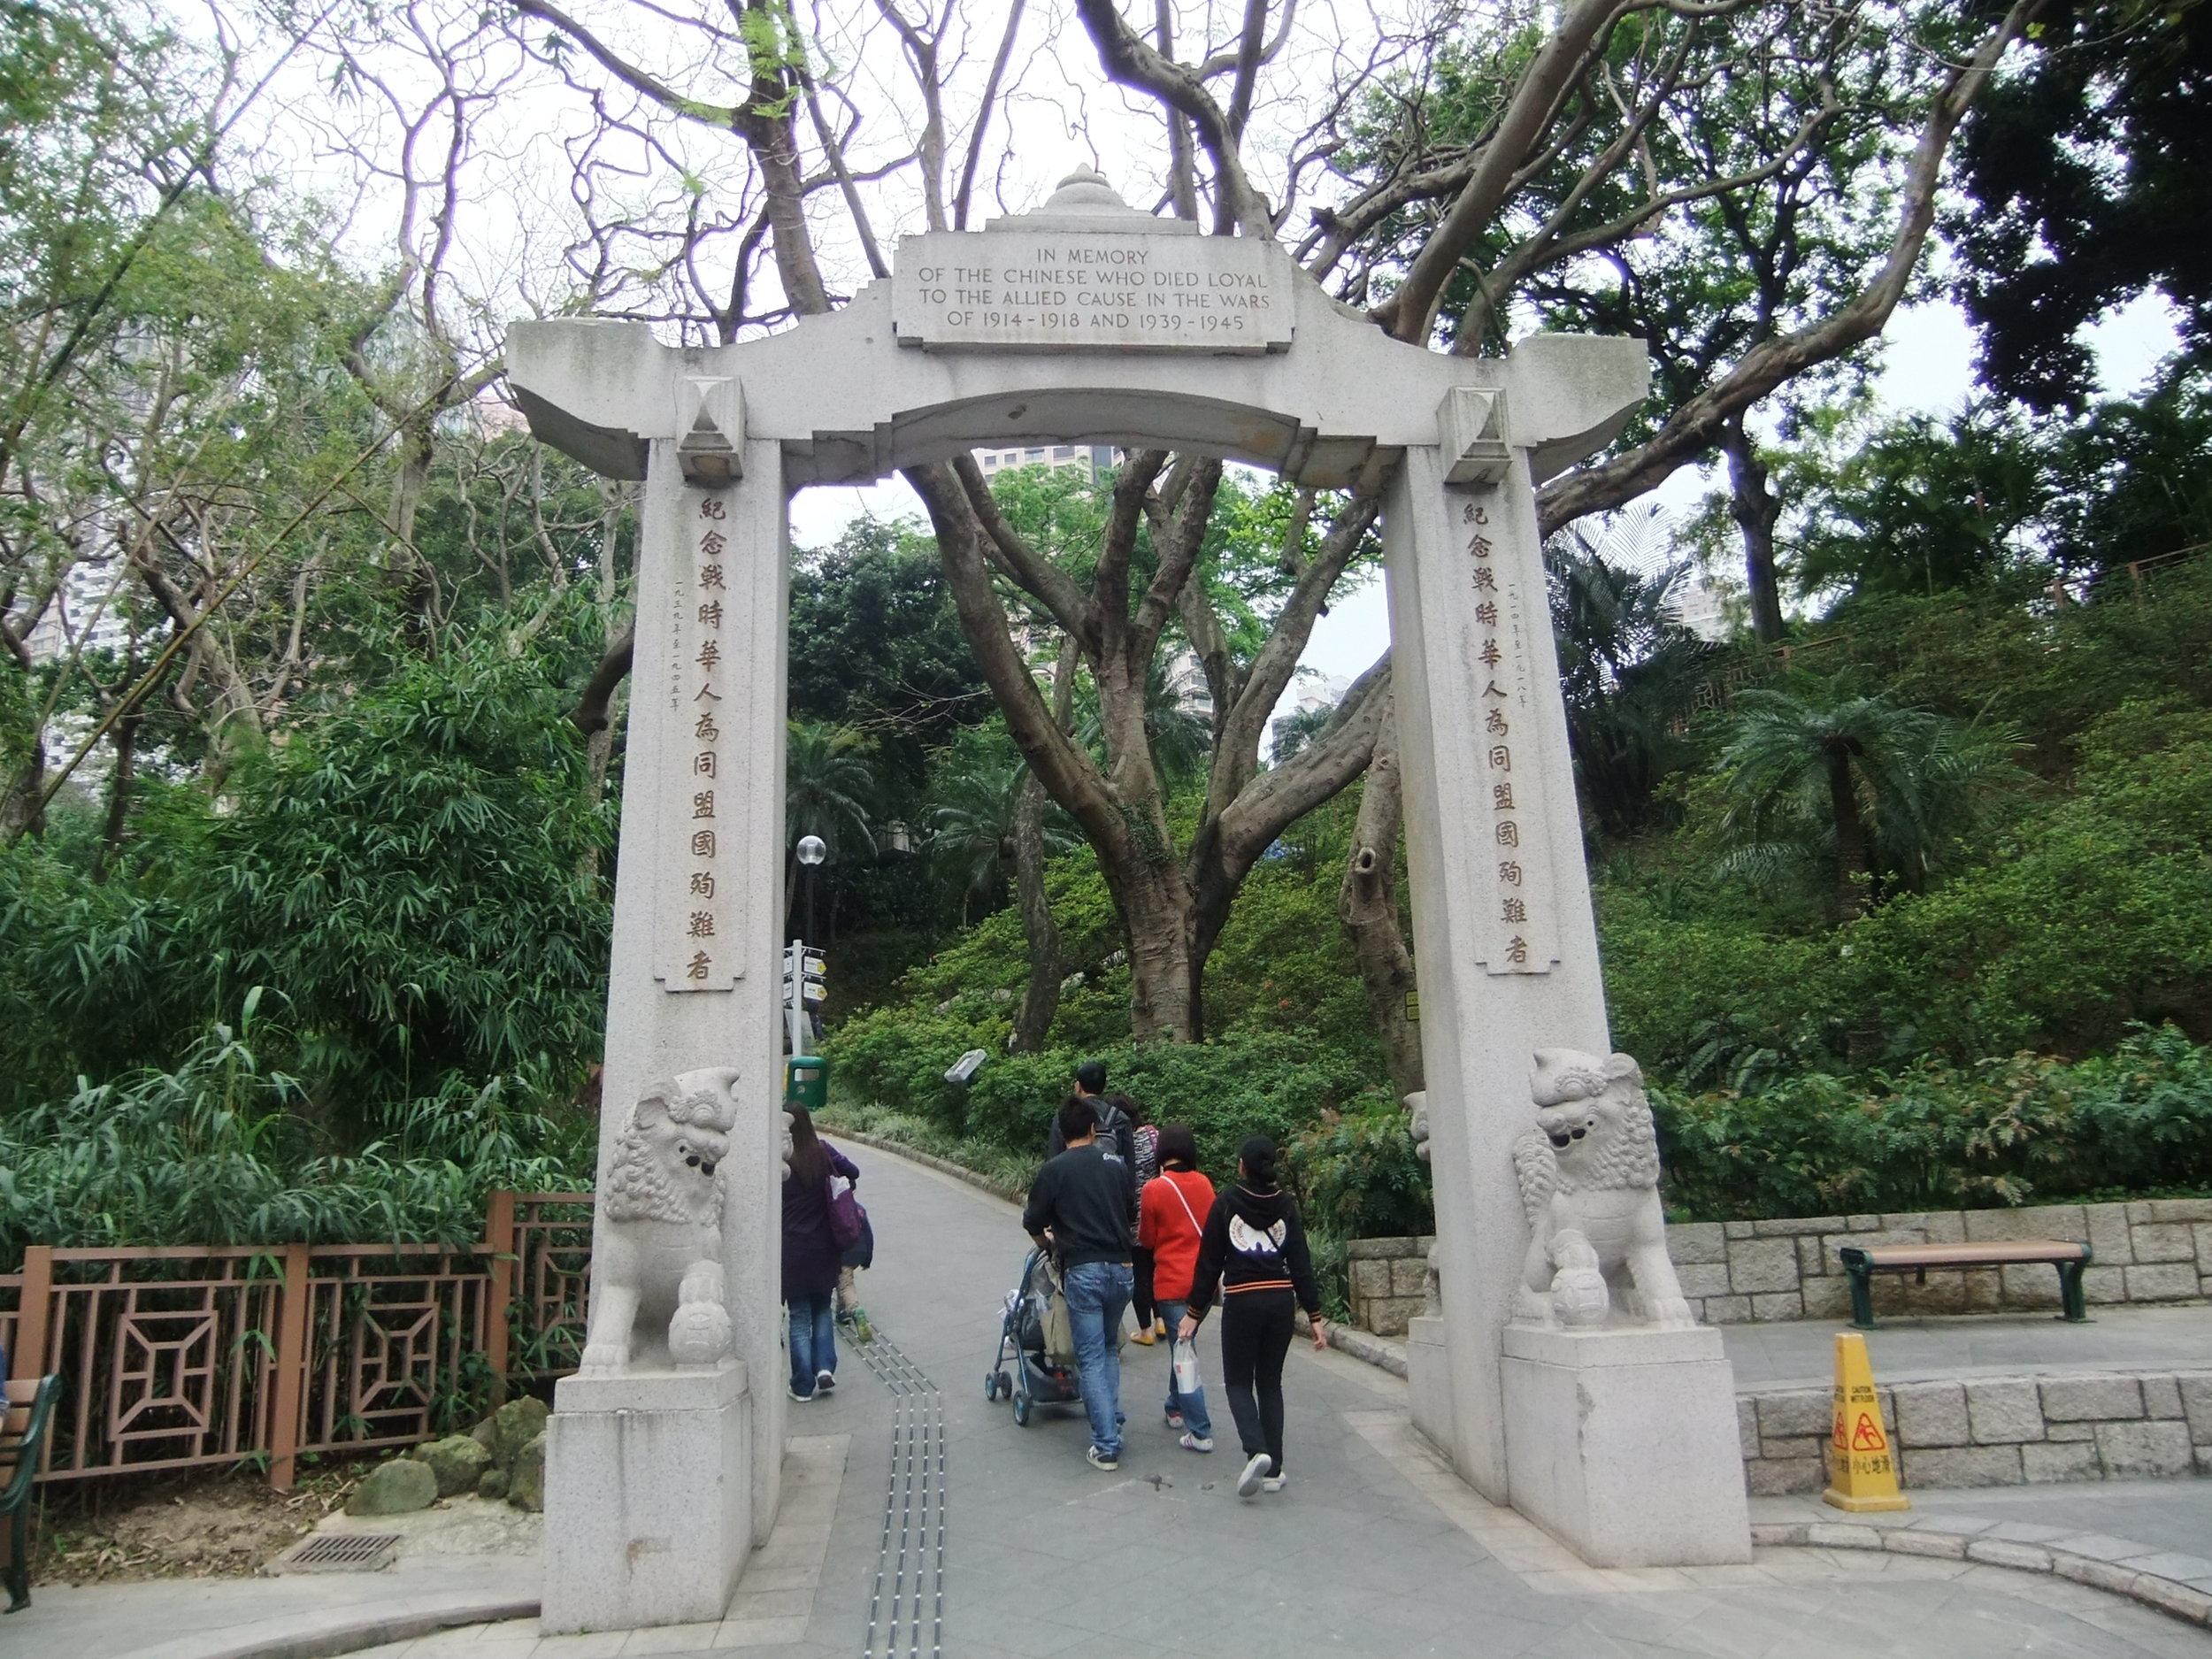 Hong Kong Chinese War Memorial